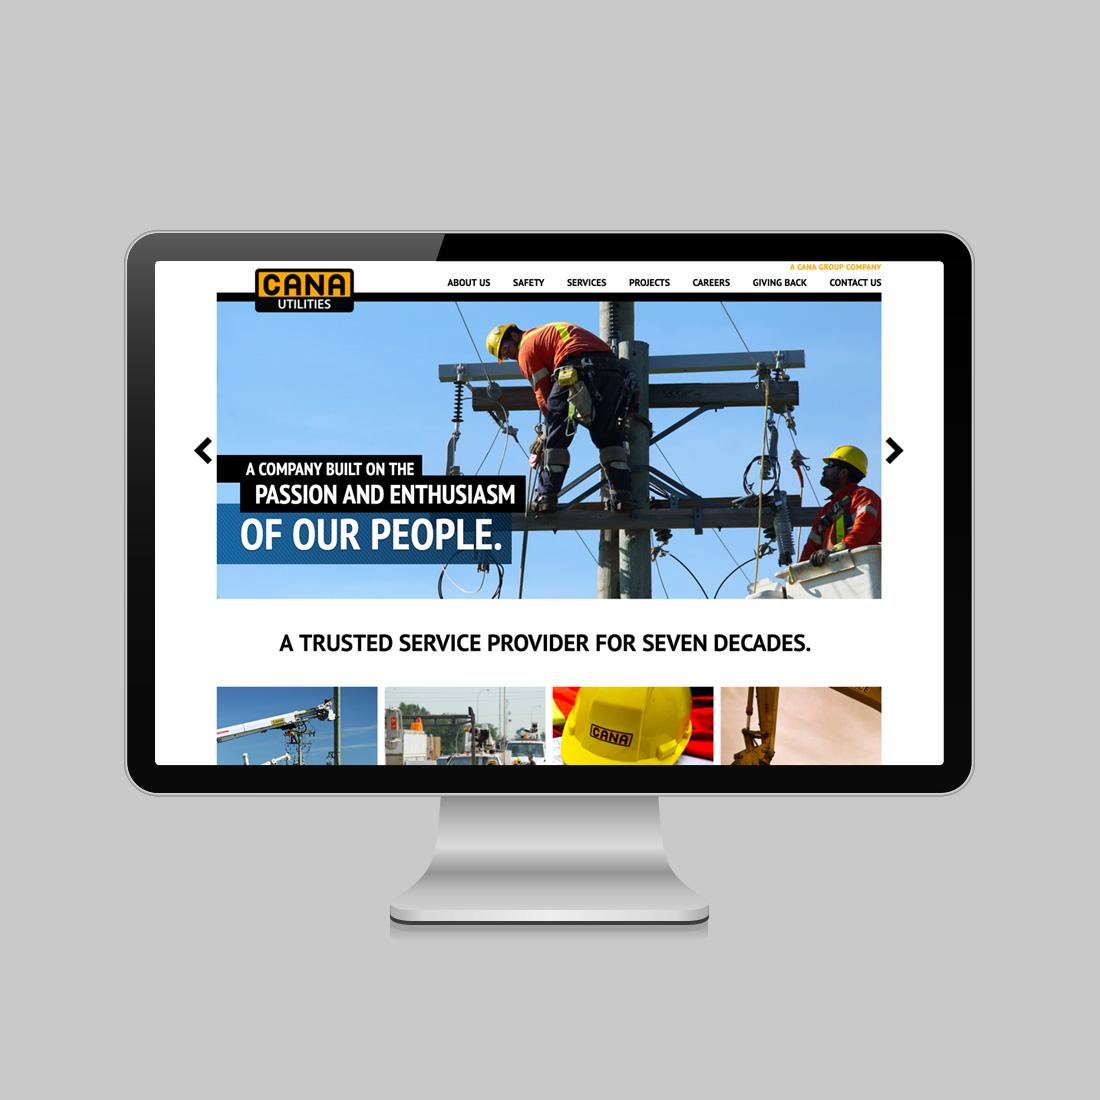 Cana Utilities homepage design